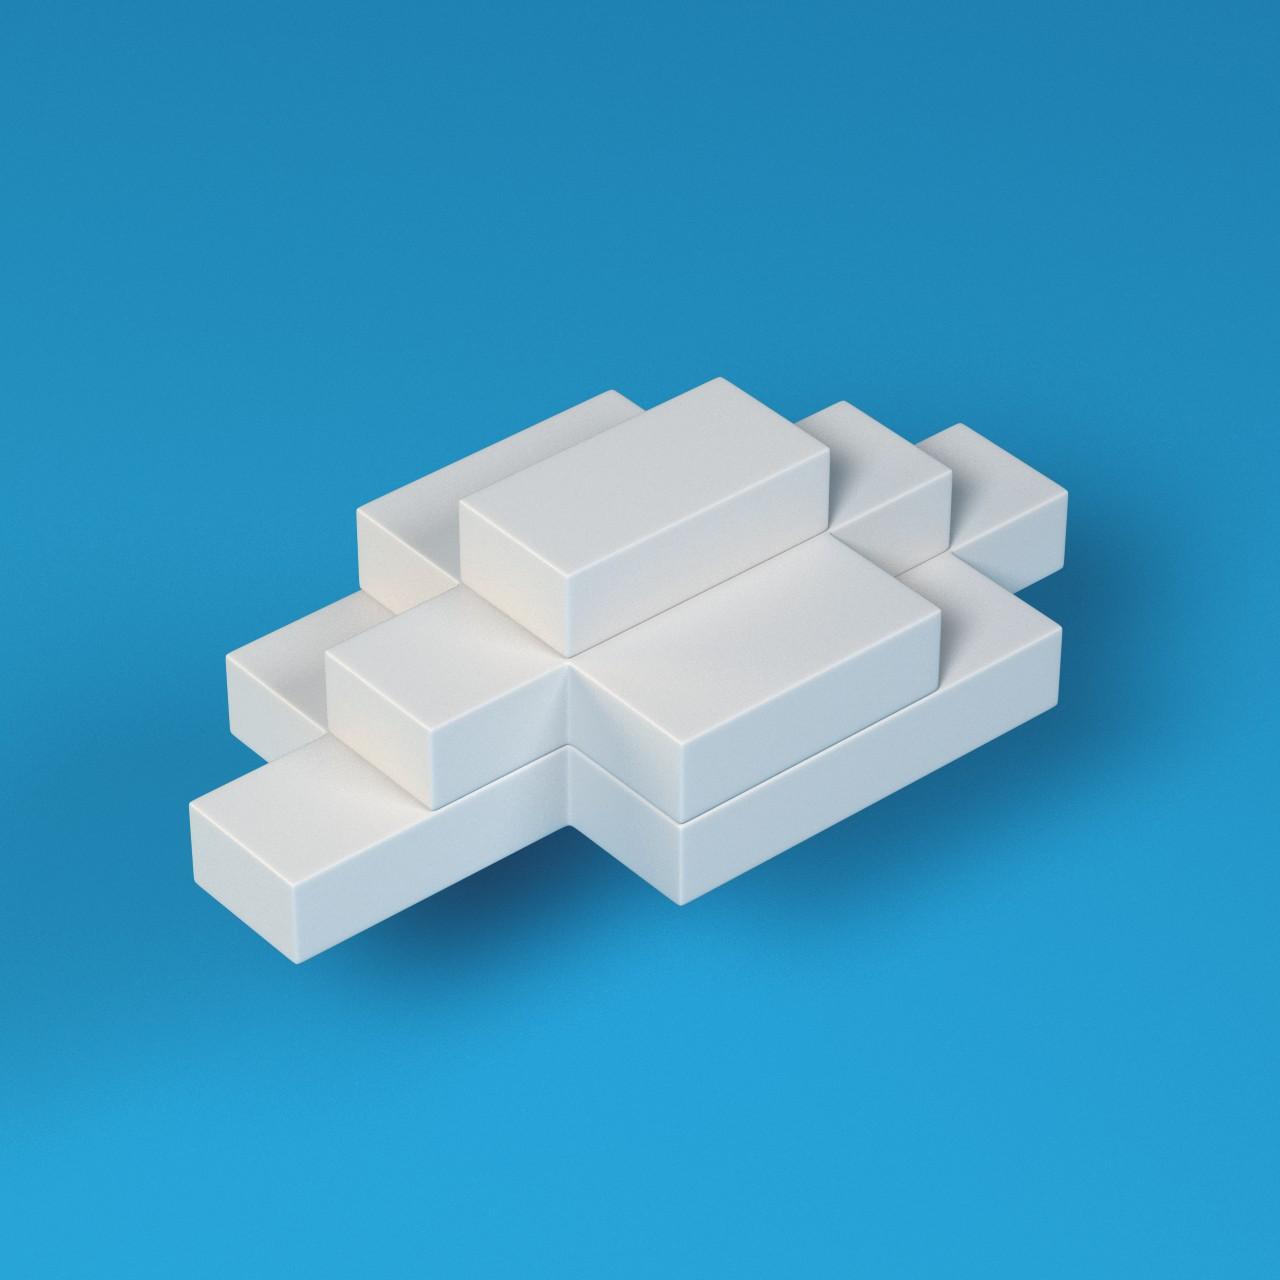 cube_cloud_3_1.jpg